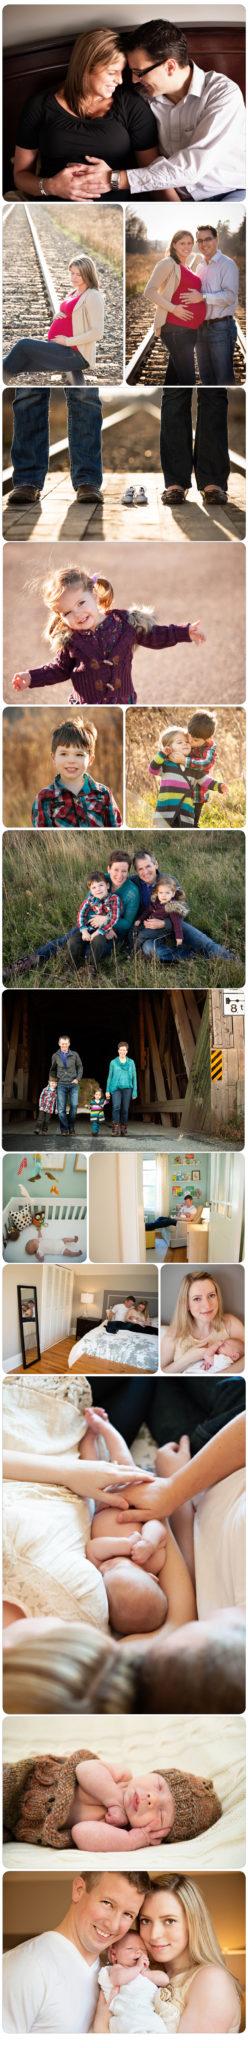 halifax_family_photography